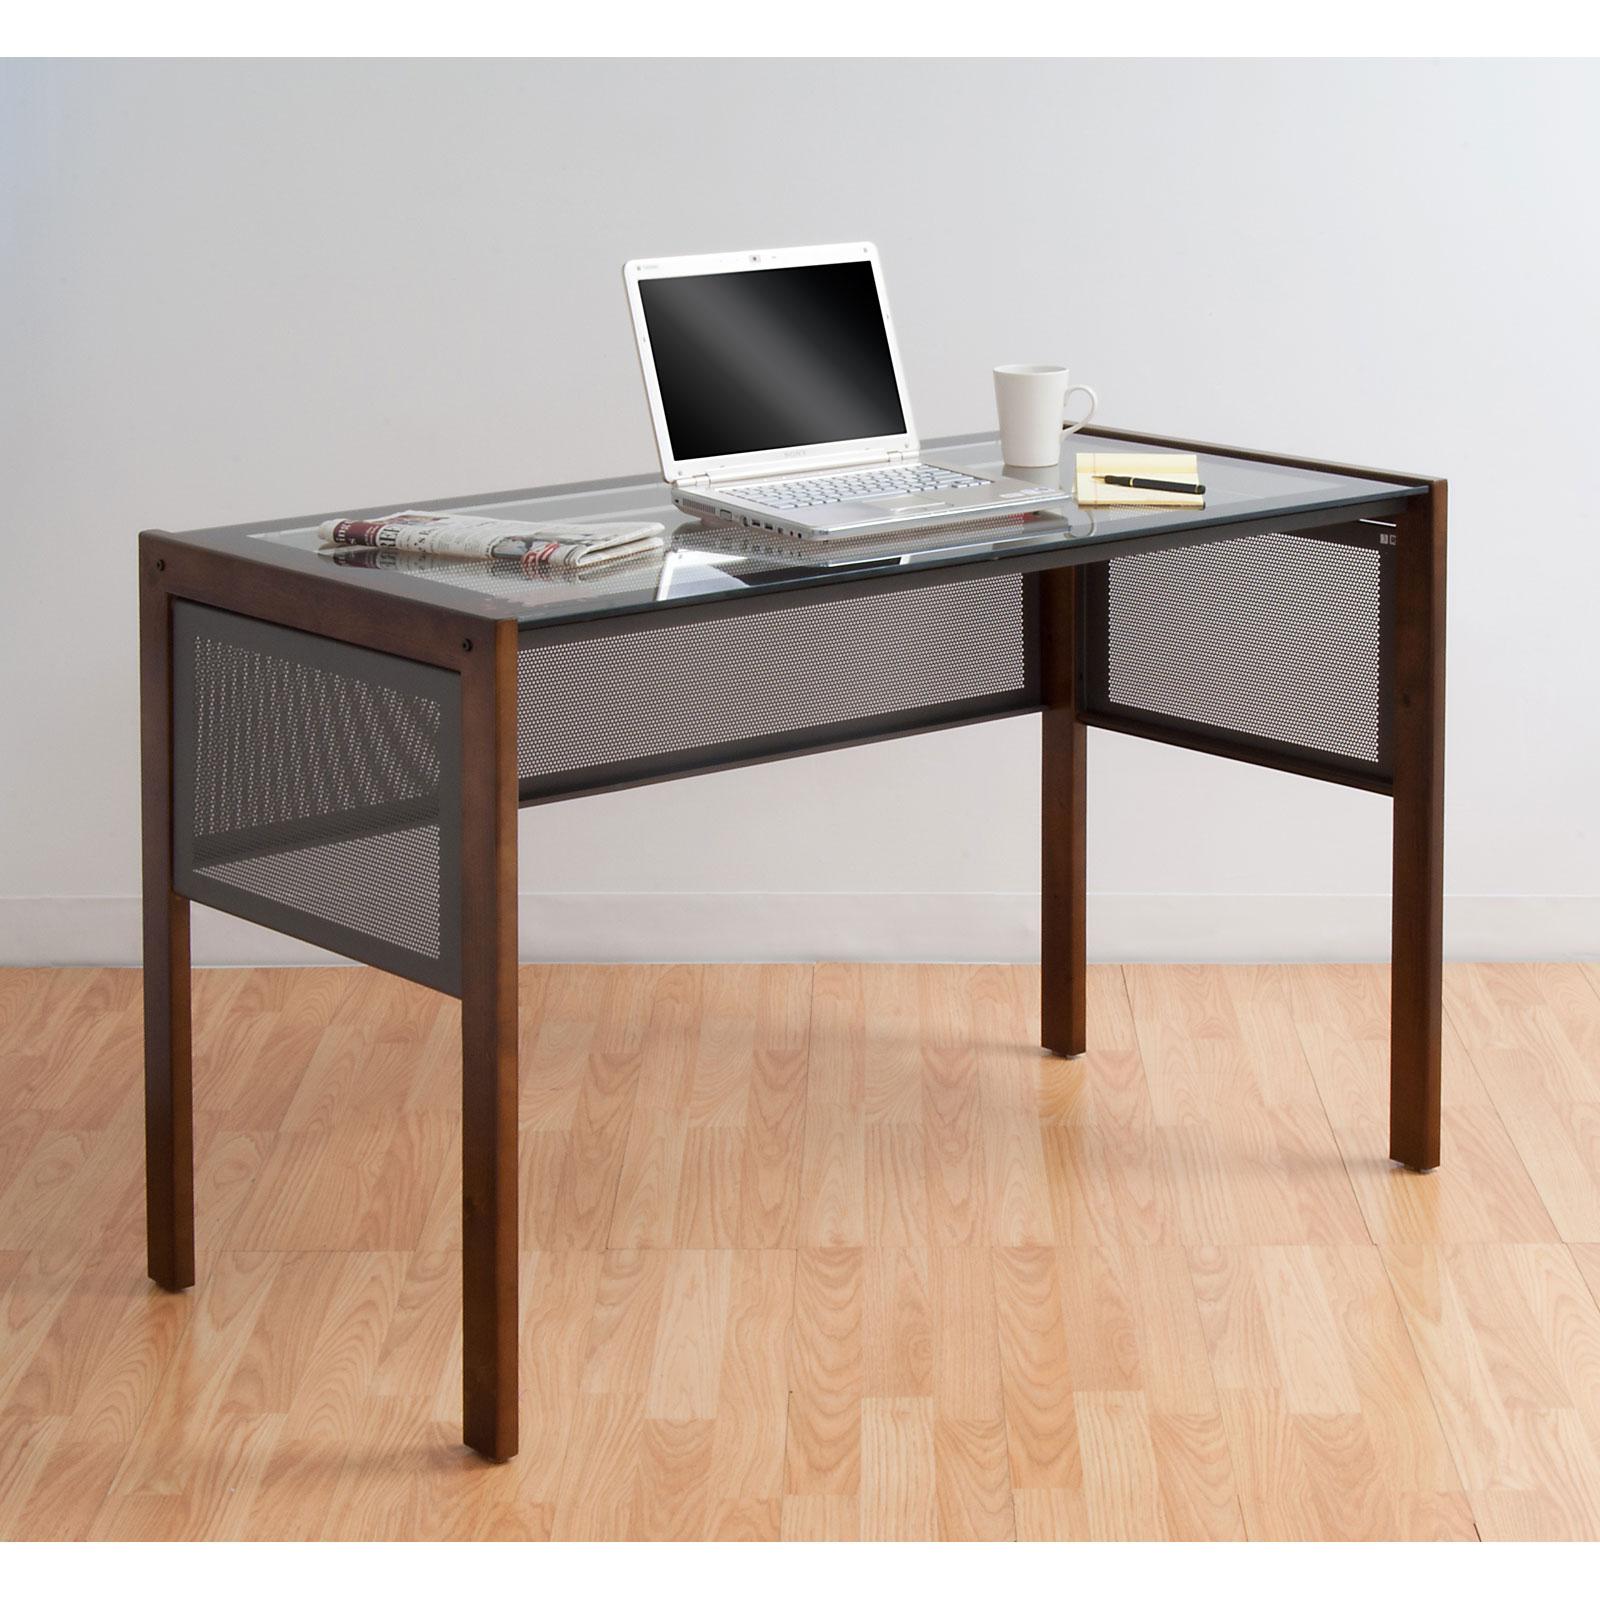 Calico Designs Office Line II Glass Top Desk By Studio Designs Price:  $74.99   $219.99